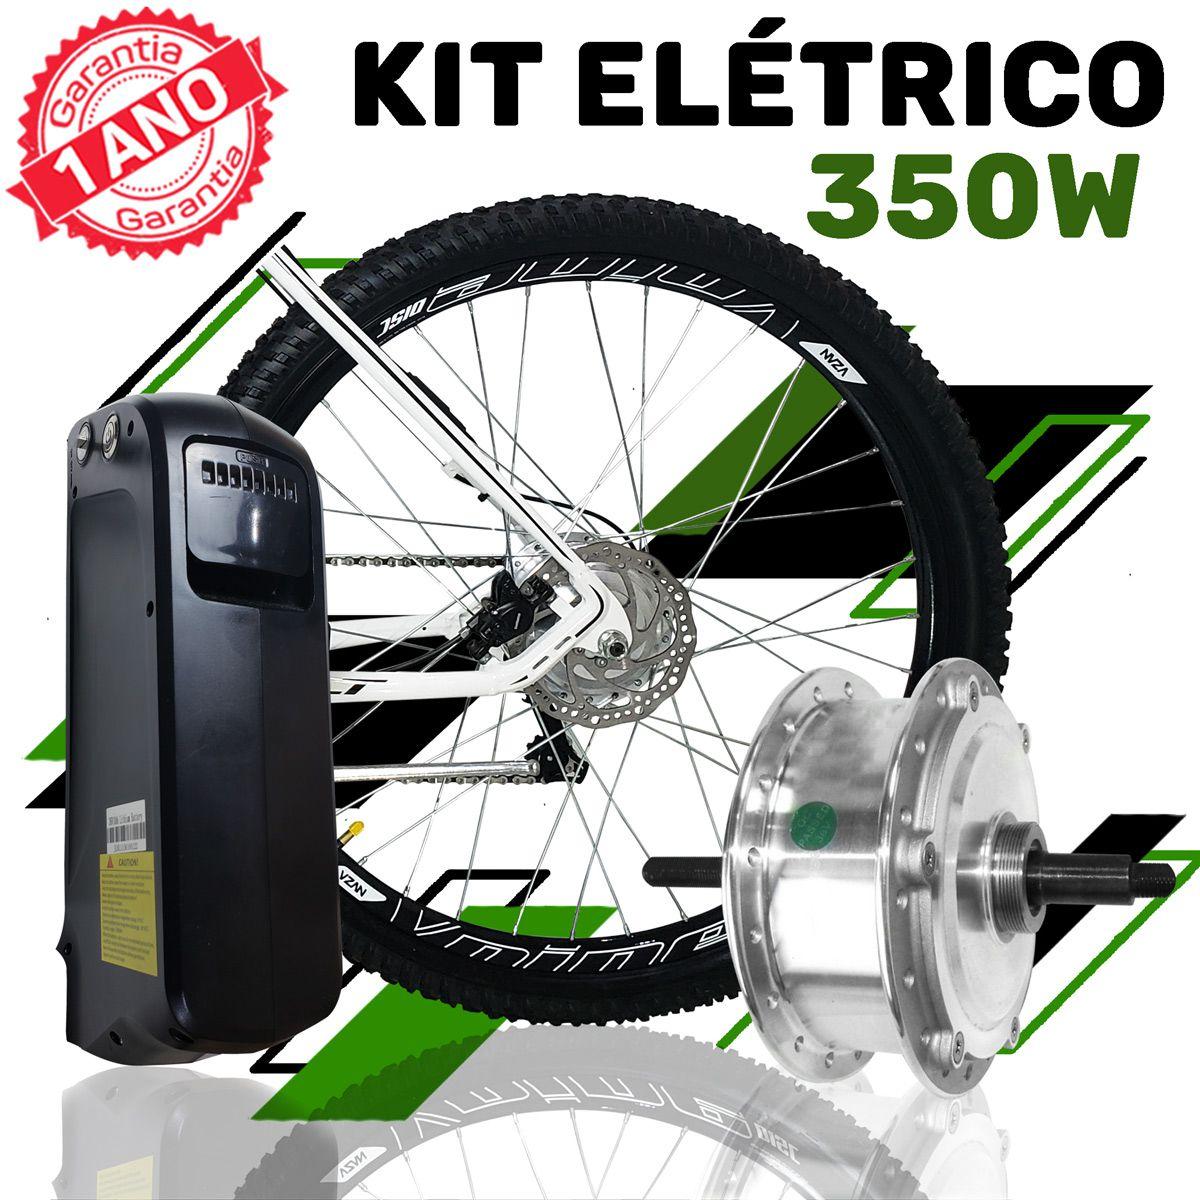 Kit Elétrico para Bicicleta - TecBike - Bateria de Trapézio - 350 Watts 36V - Aro 29